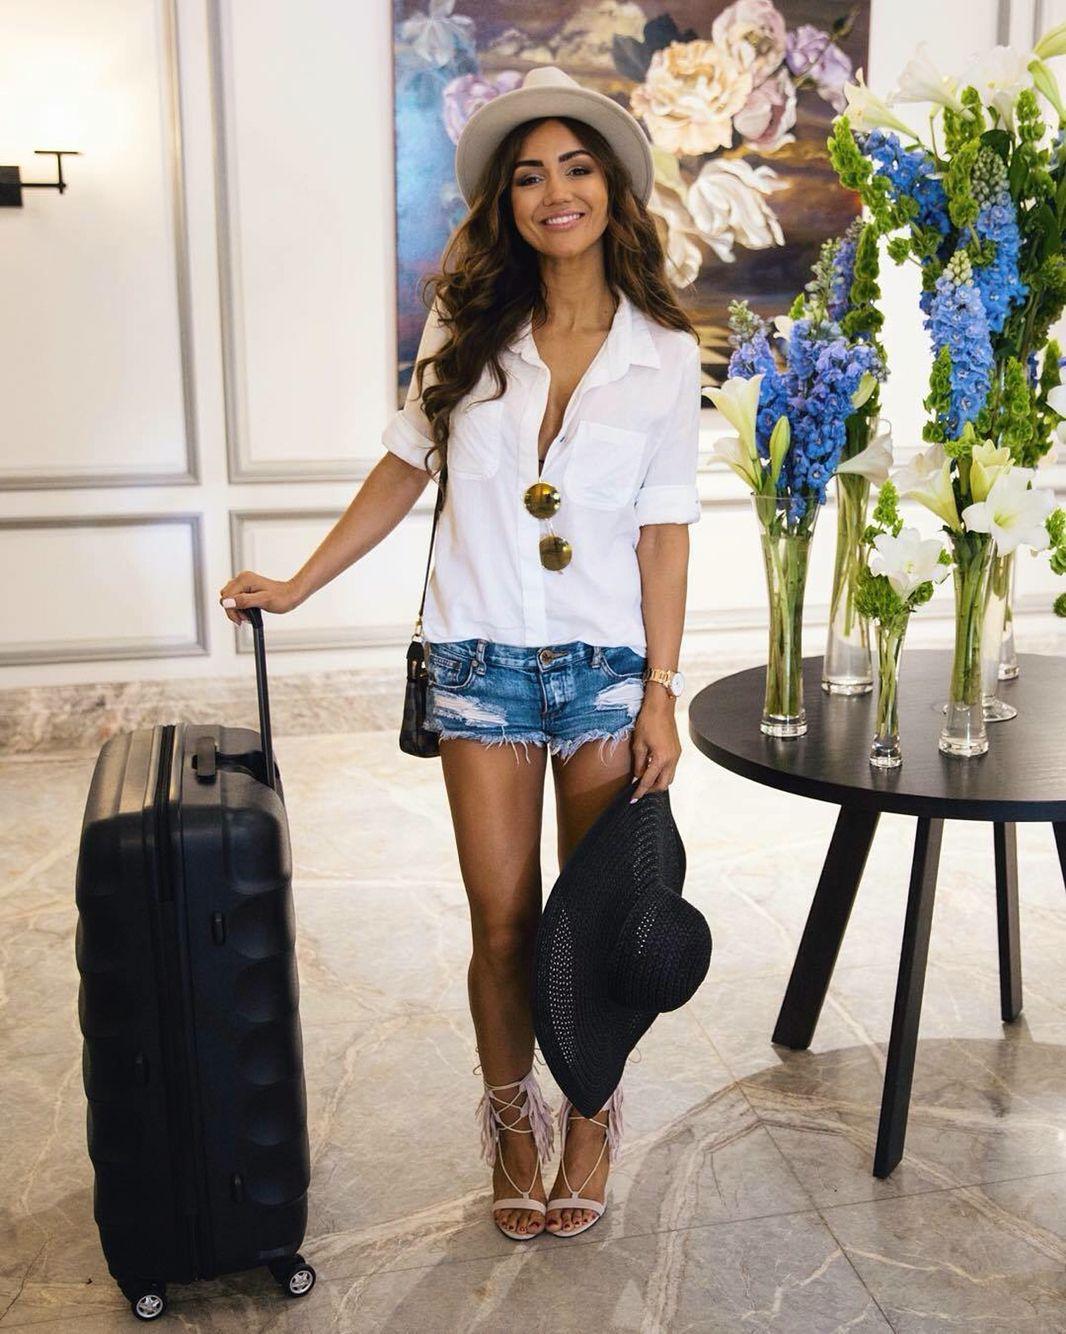 Pia Muehlenbeck Celebrities Faces Pinterest Airport